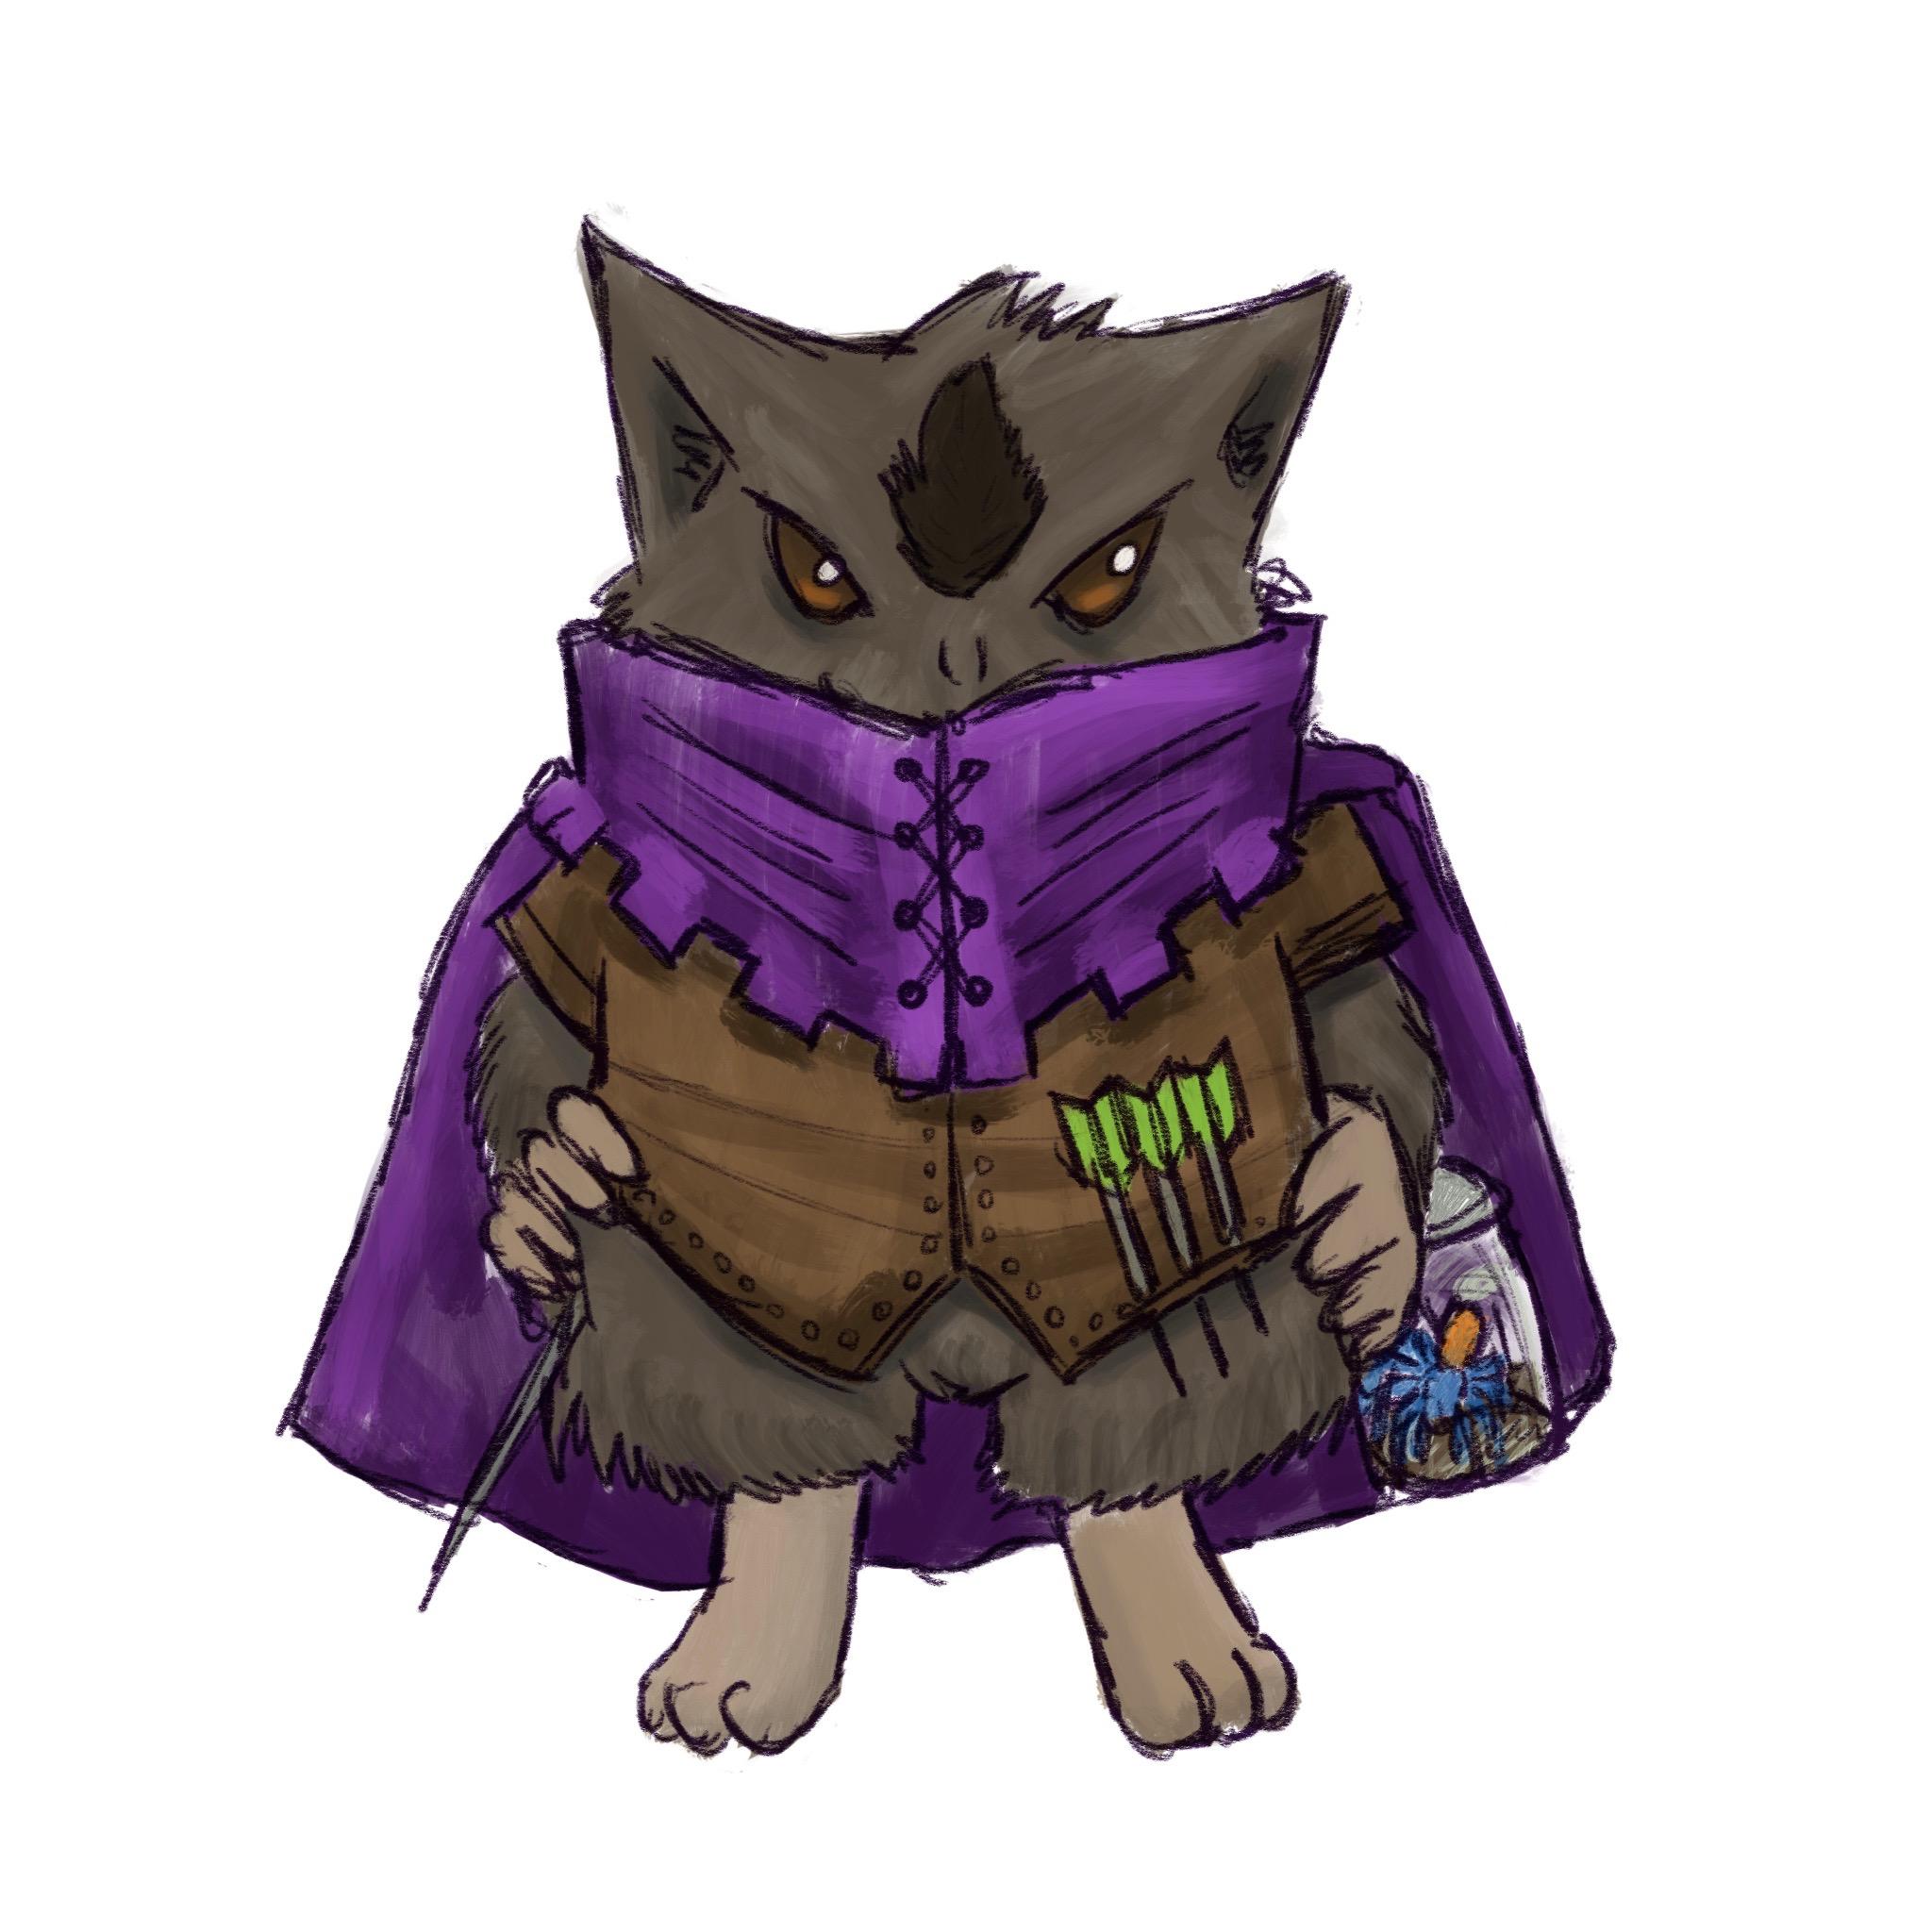 Whisper, a Michtim Bard wearing a purple cloak with high collar